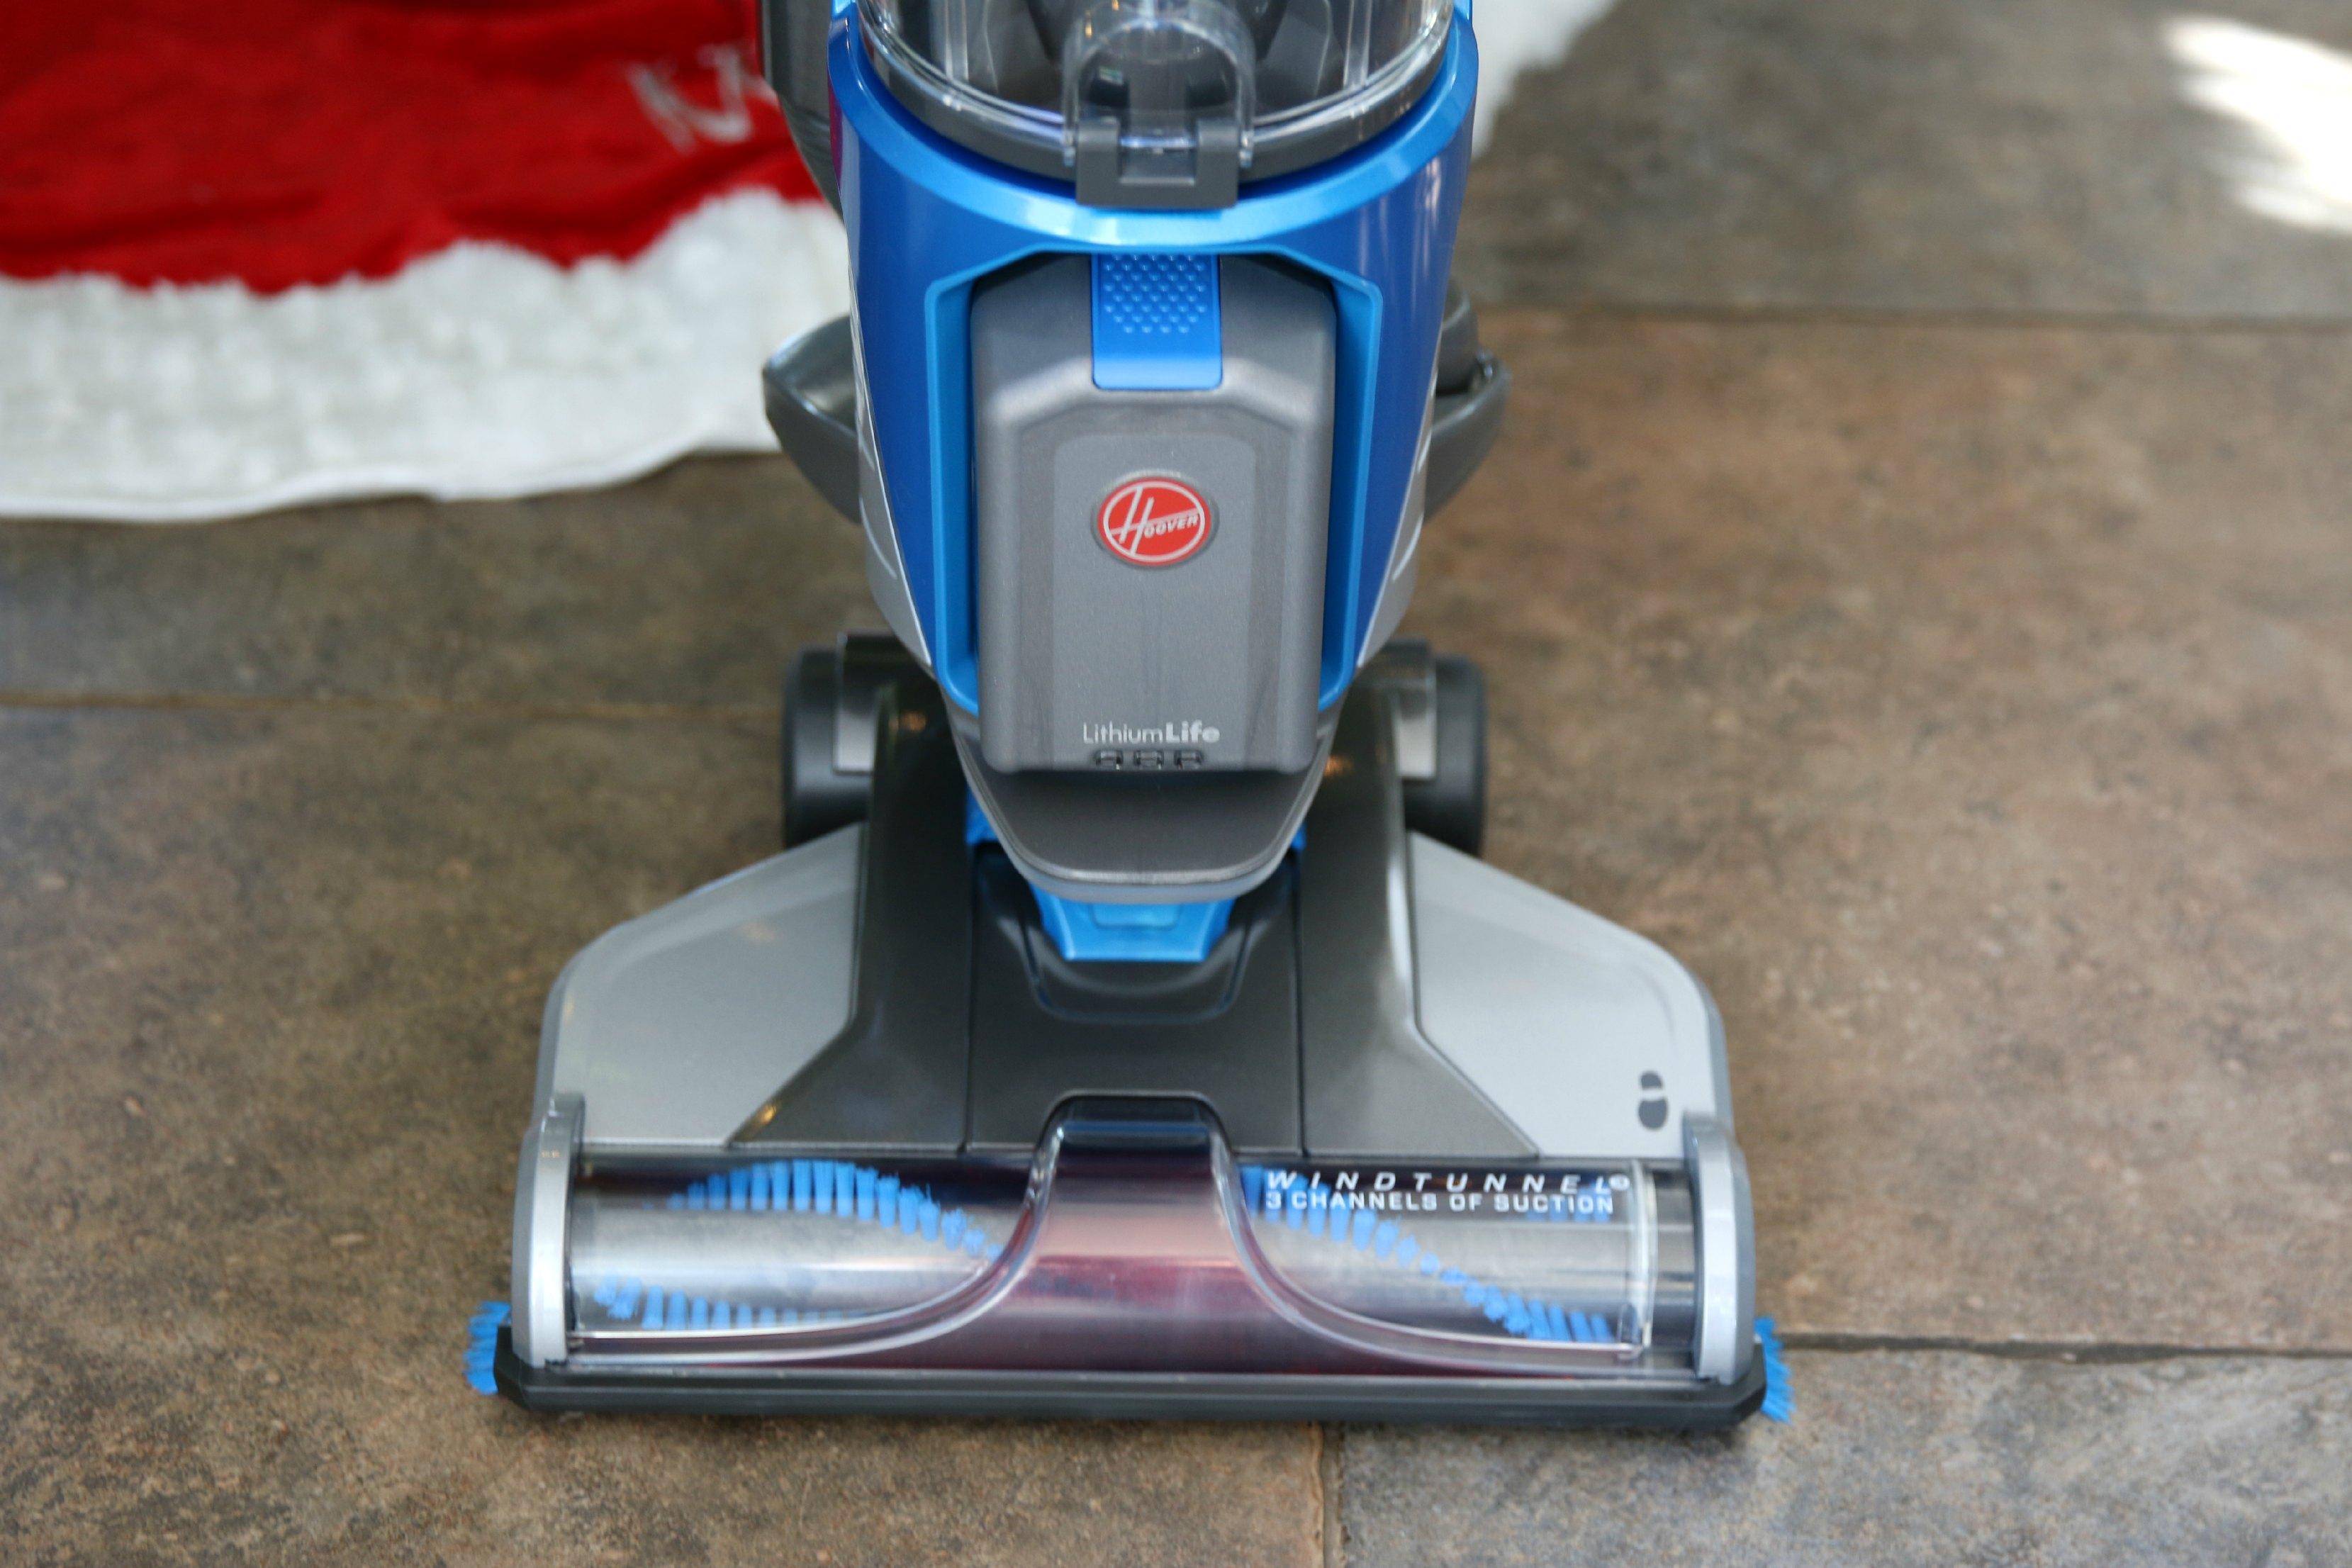 hoover cordless vacuum